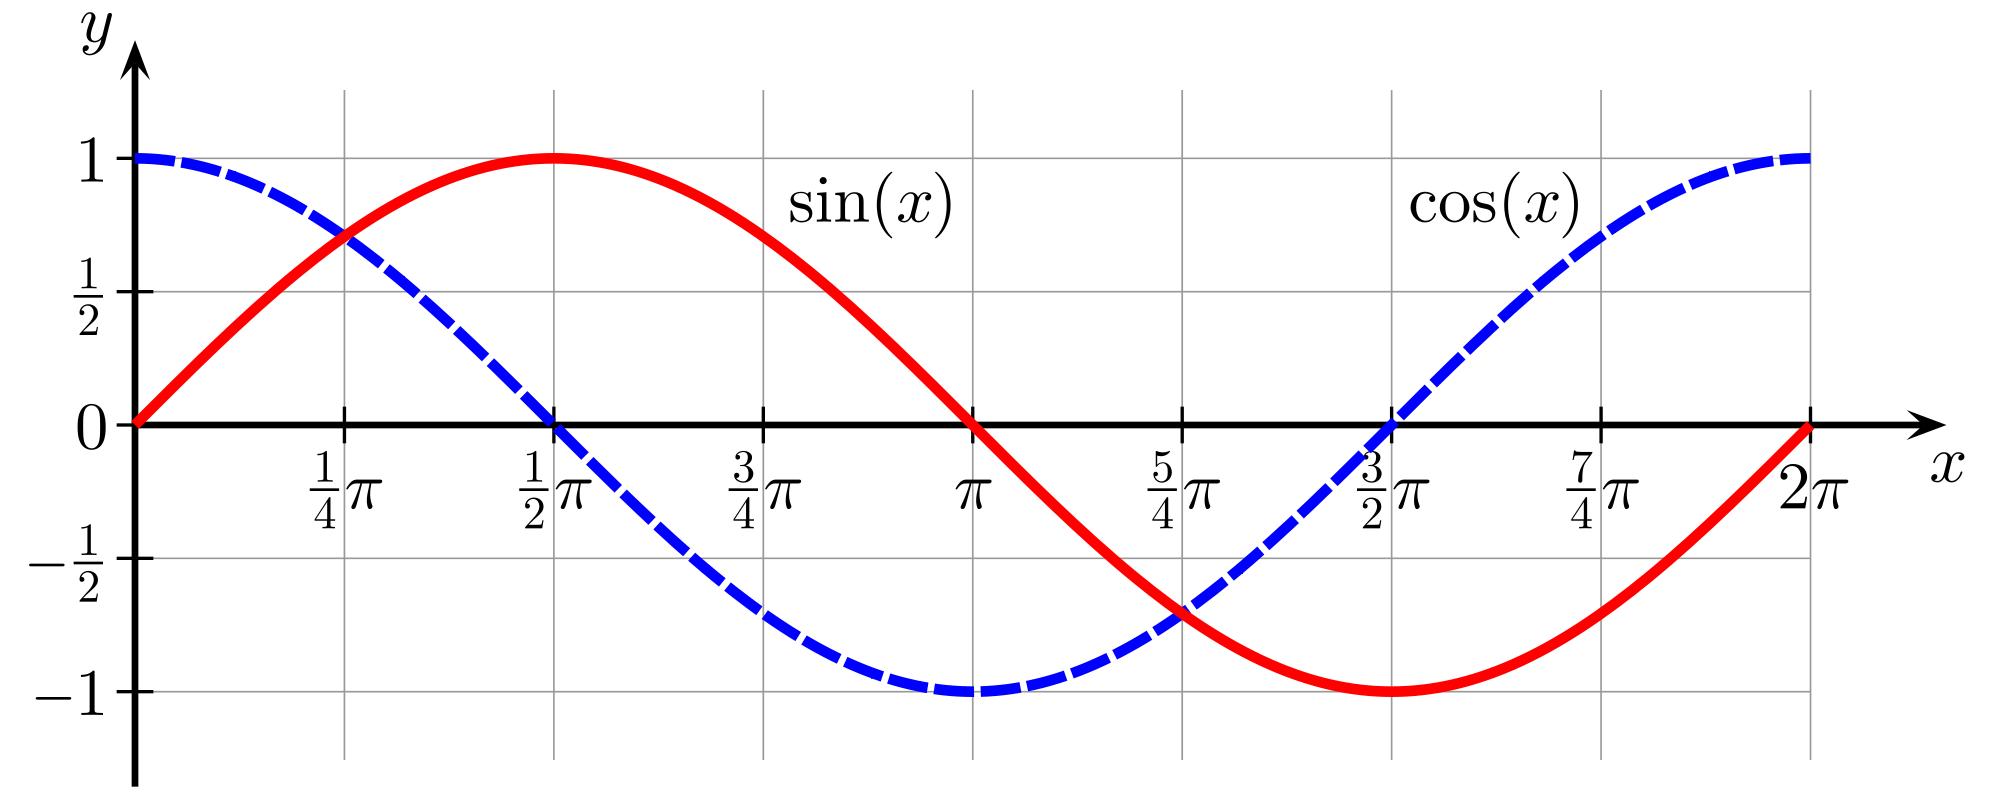 Pin by C Tilman on Precalculus | Pinterest | Precalculus ...